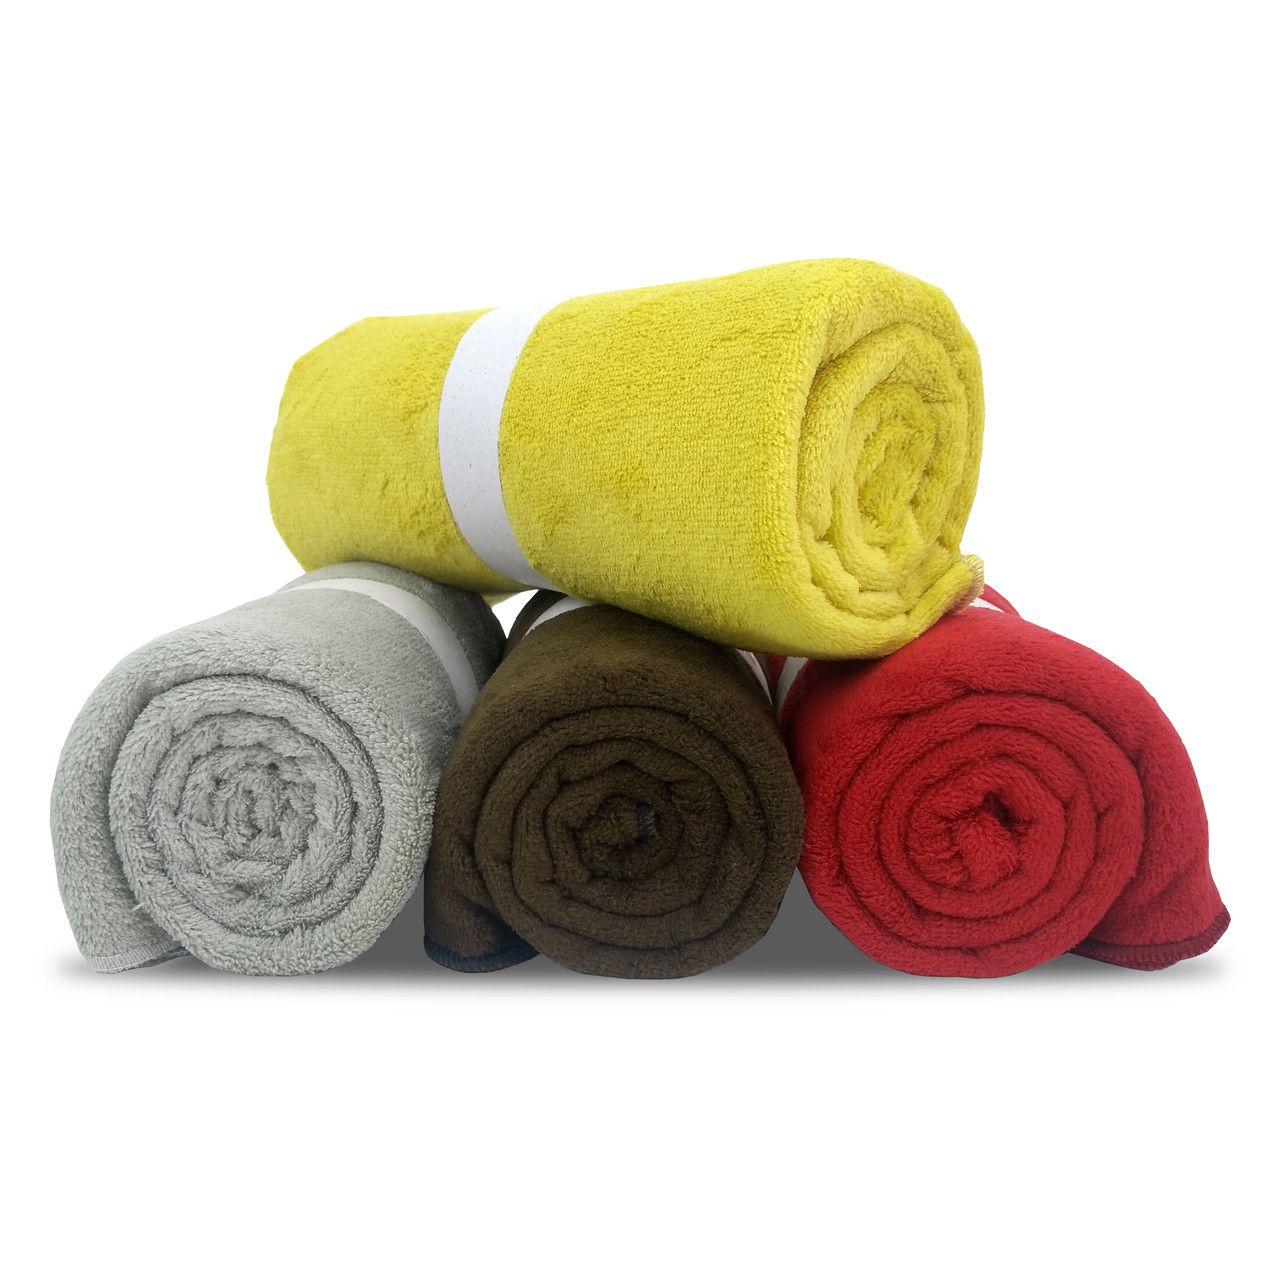 Kit 4 Manta Pet Fleece Microfibra Cobertor Cães Gato 1,10 x 0,90m - Berve Enxovais